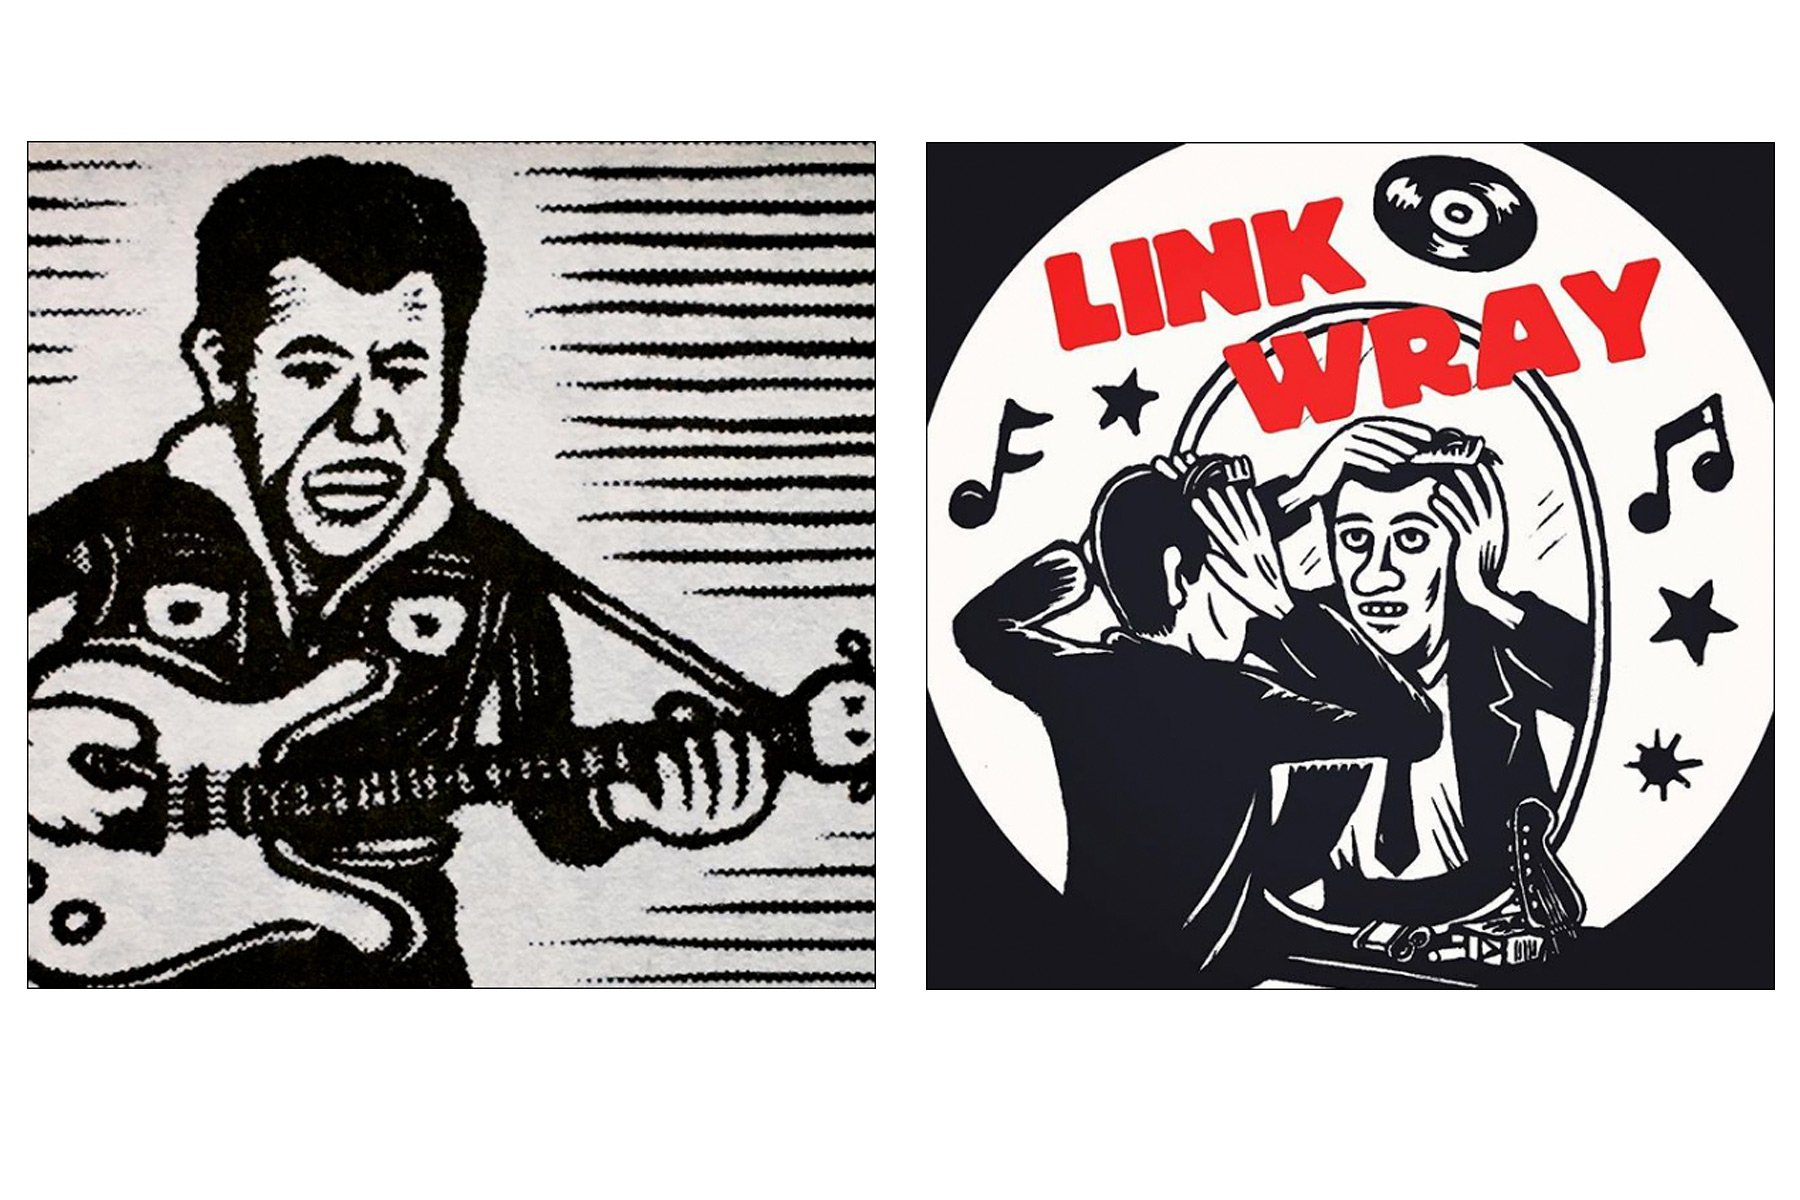 Link Wray drawings by artist Avi Spivak. Ponyboy magazine.